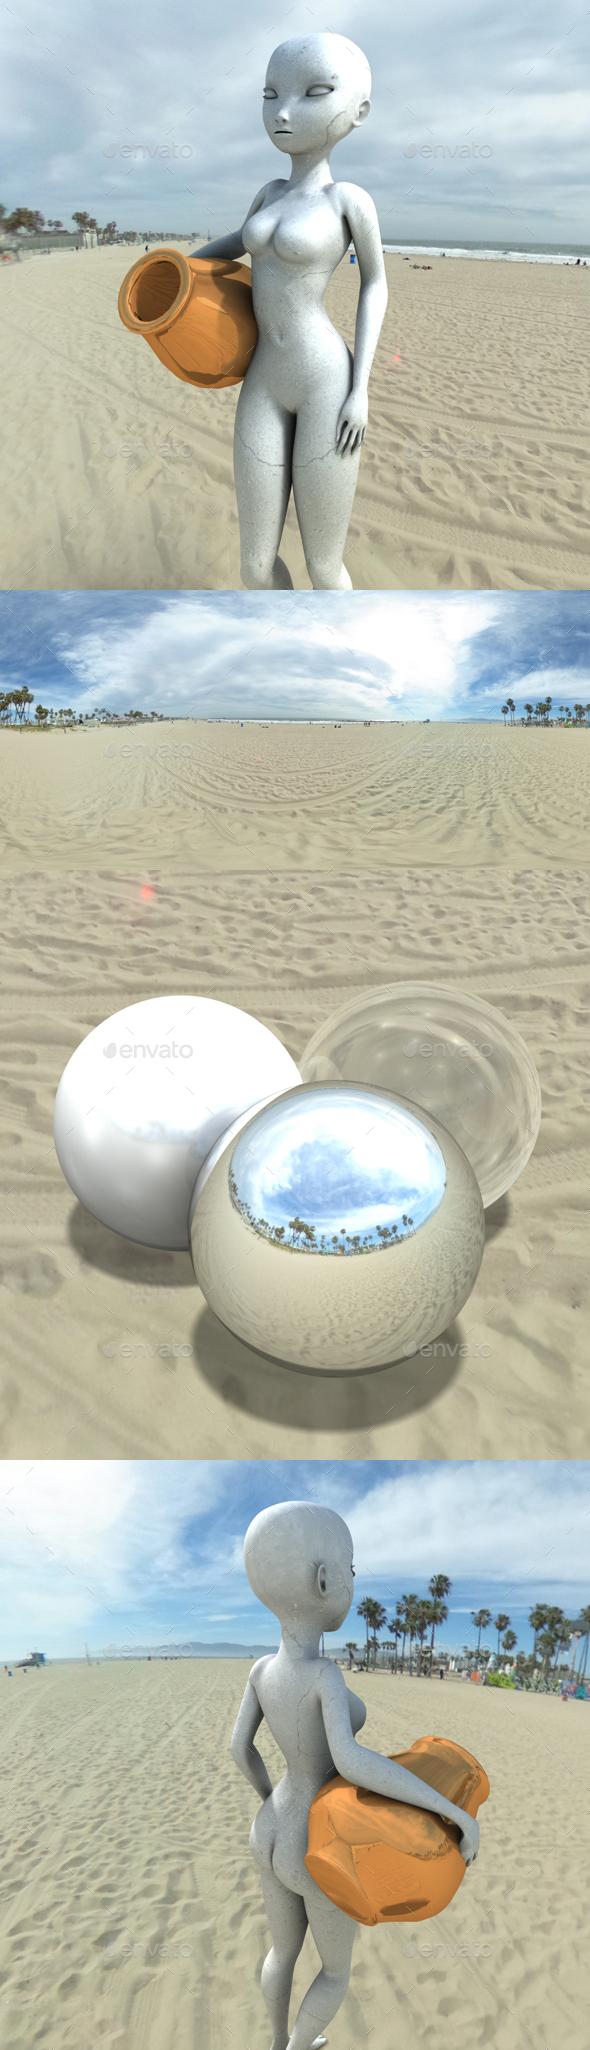 Bright Cloudy Venice Beach HDRI - 3DOcean Item for Sale